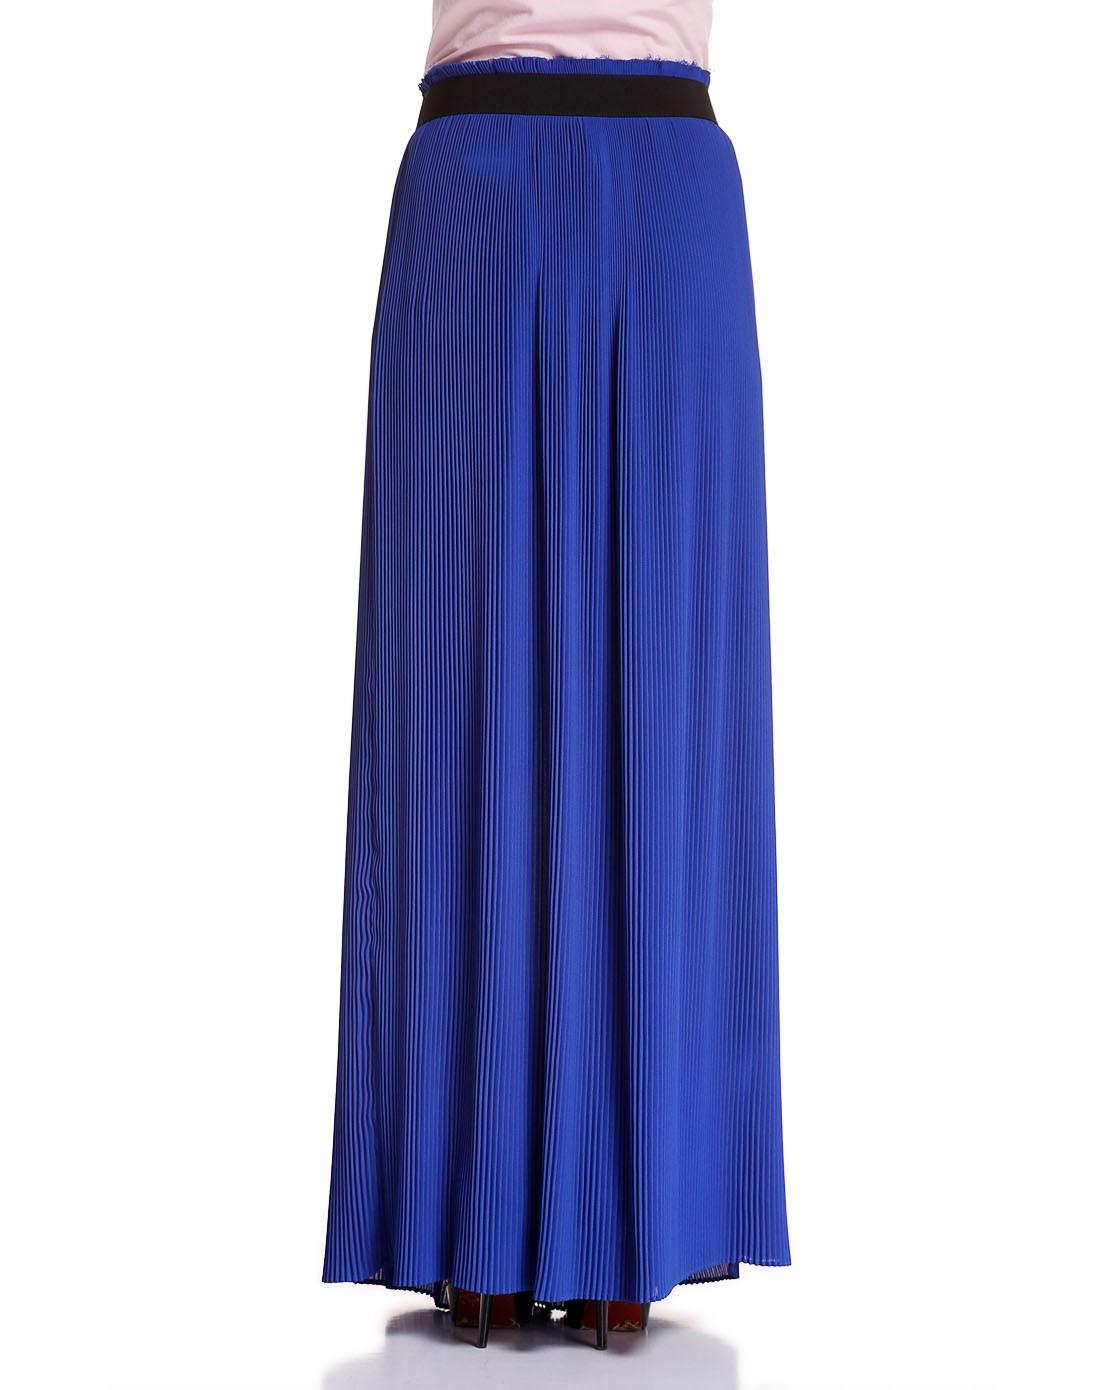 department5女款高雅时尚半身长裙蓝色